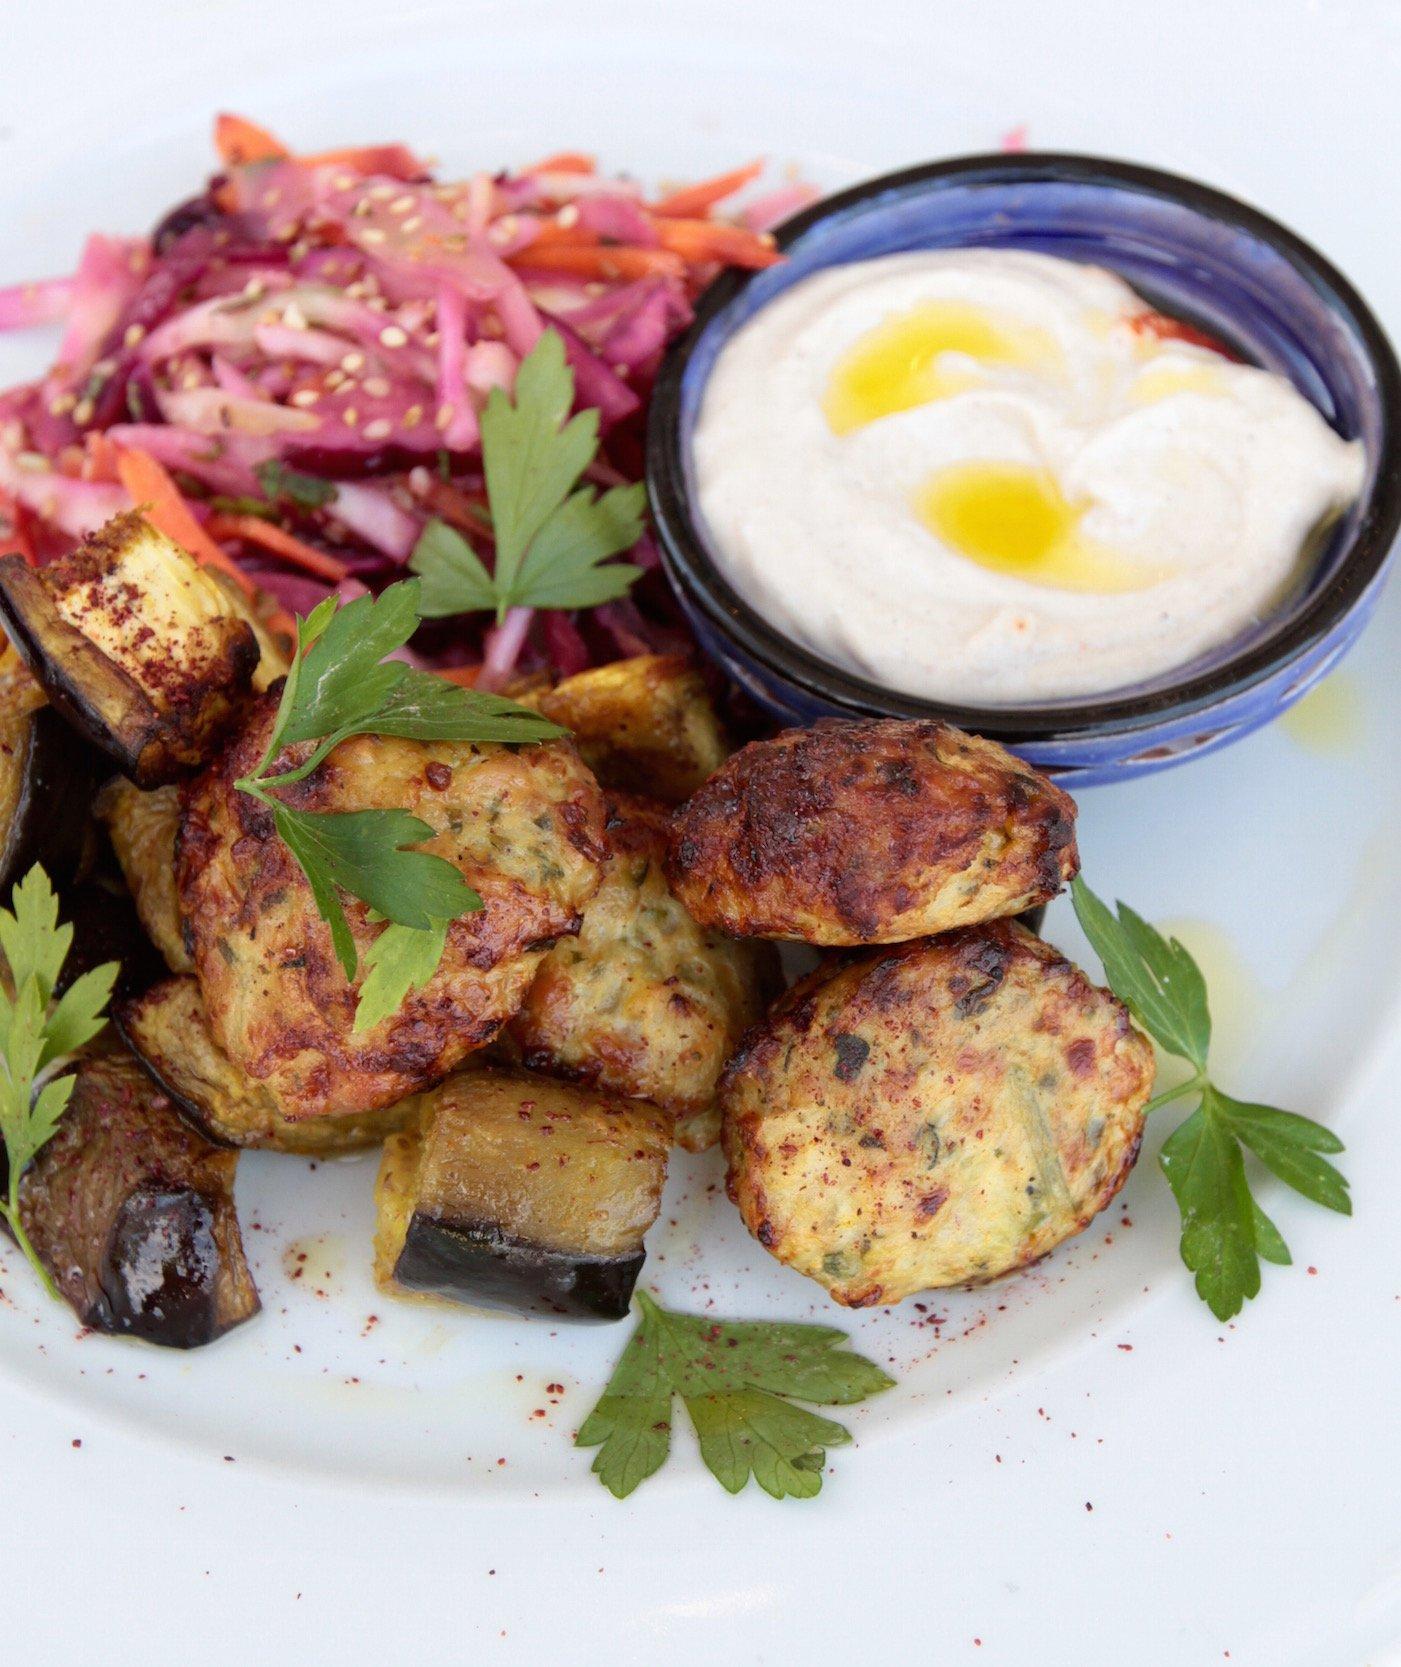 Chicken zucchini balls by Tanja Ting-Pure Goodness